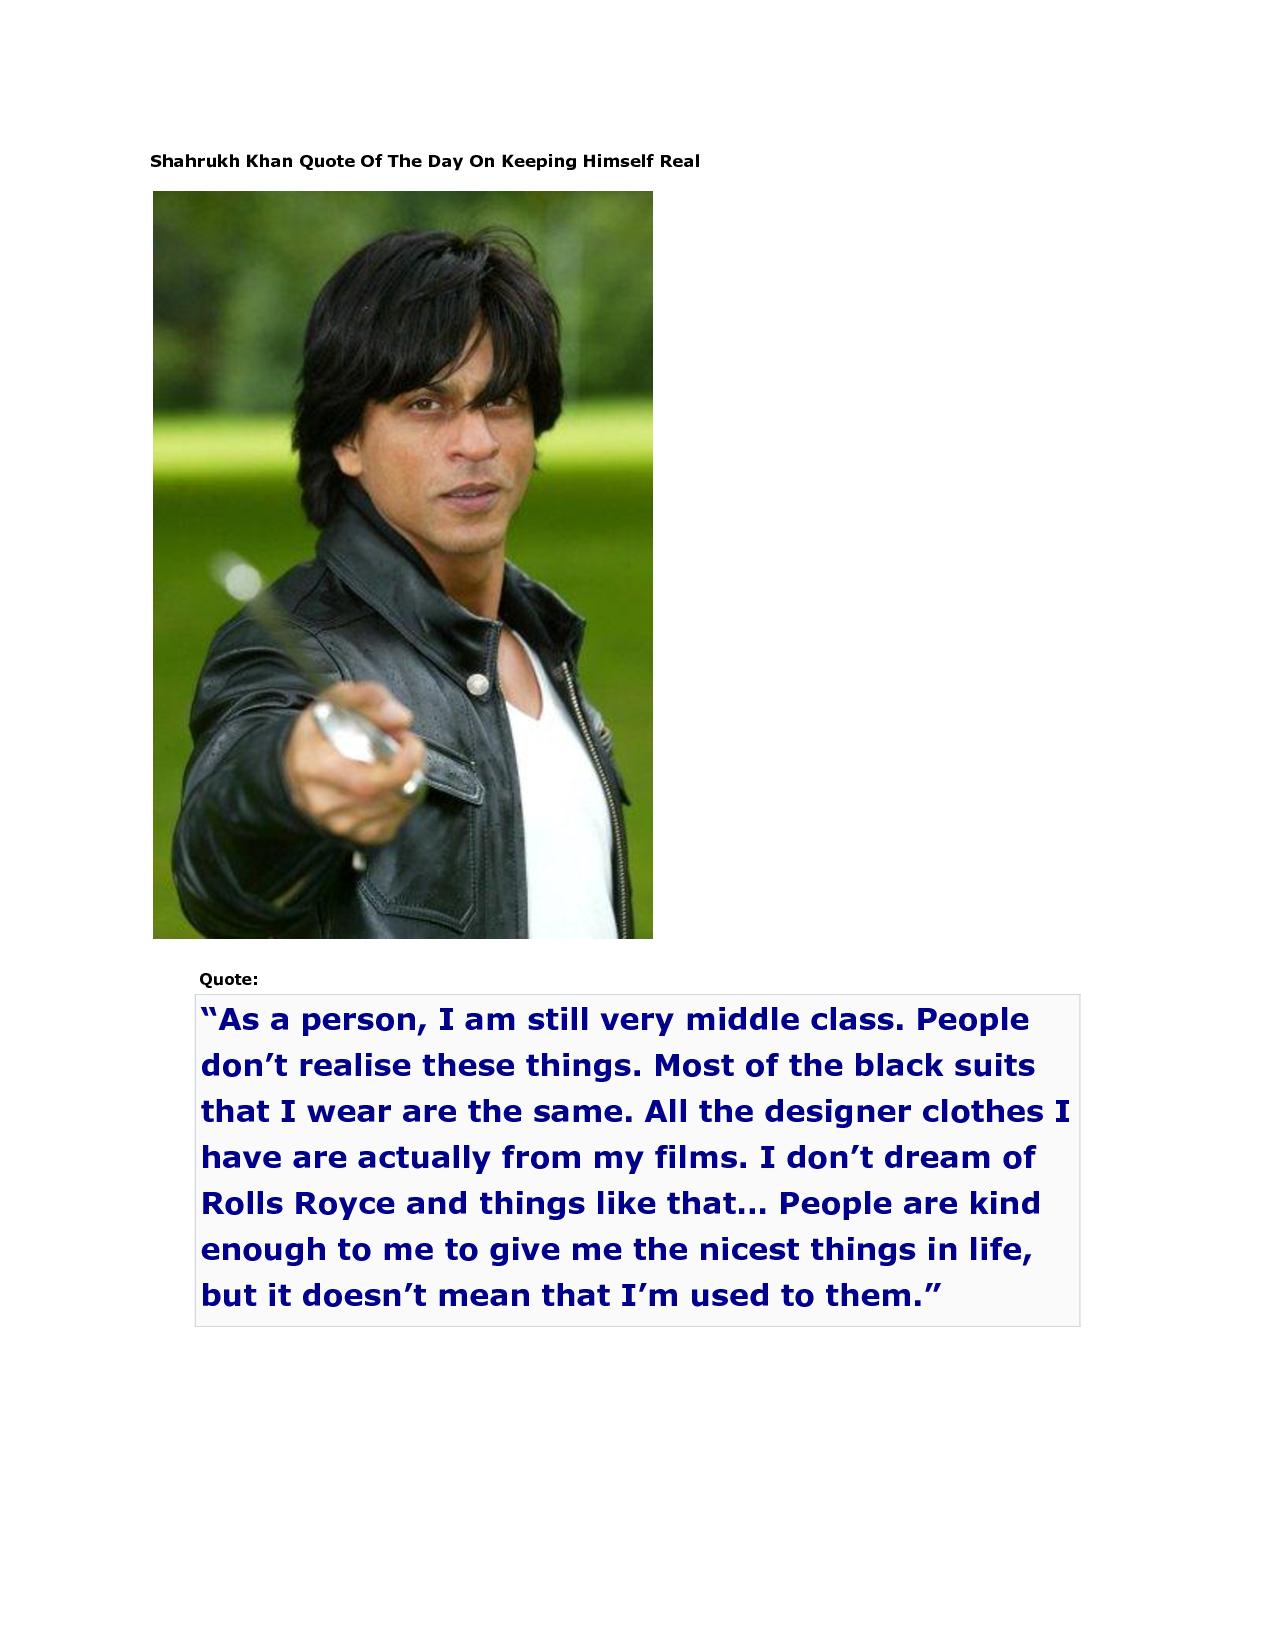 Shahrukh Khan's quote #2